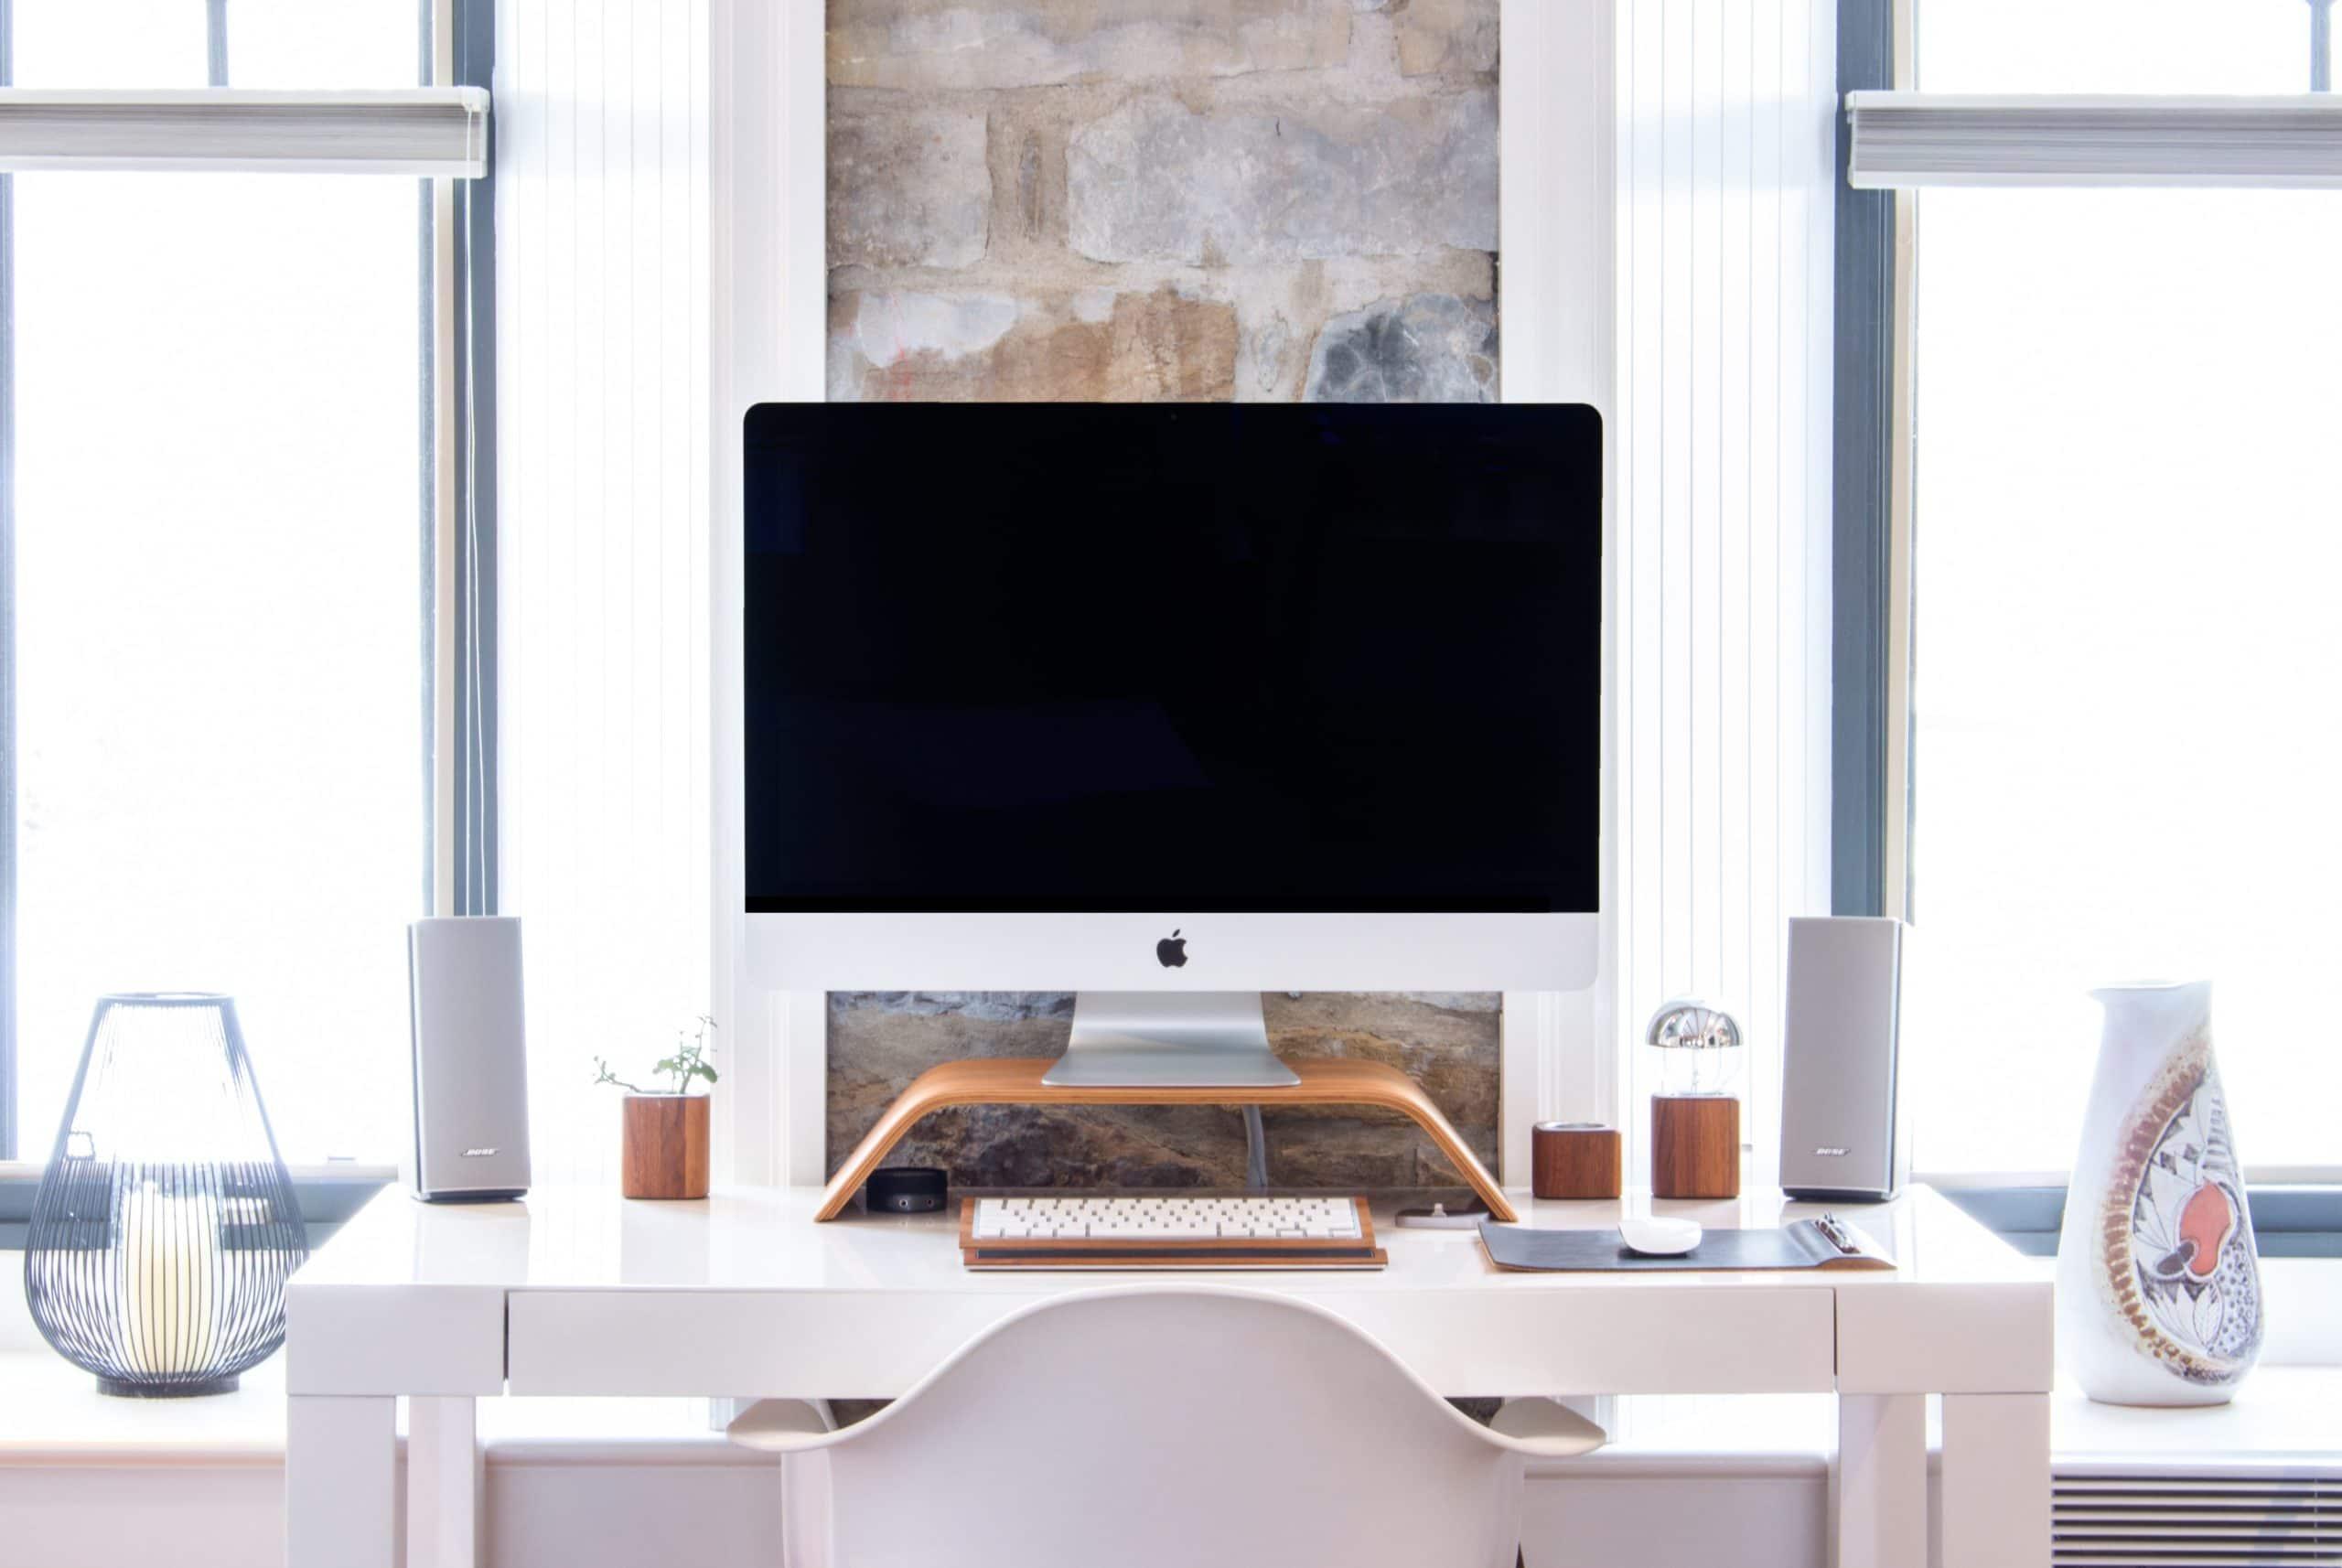 Home Office com iMac na mesa